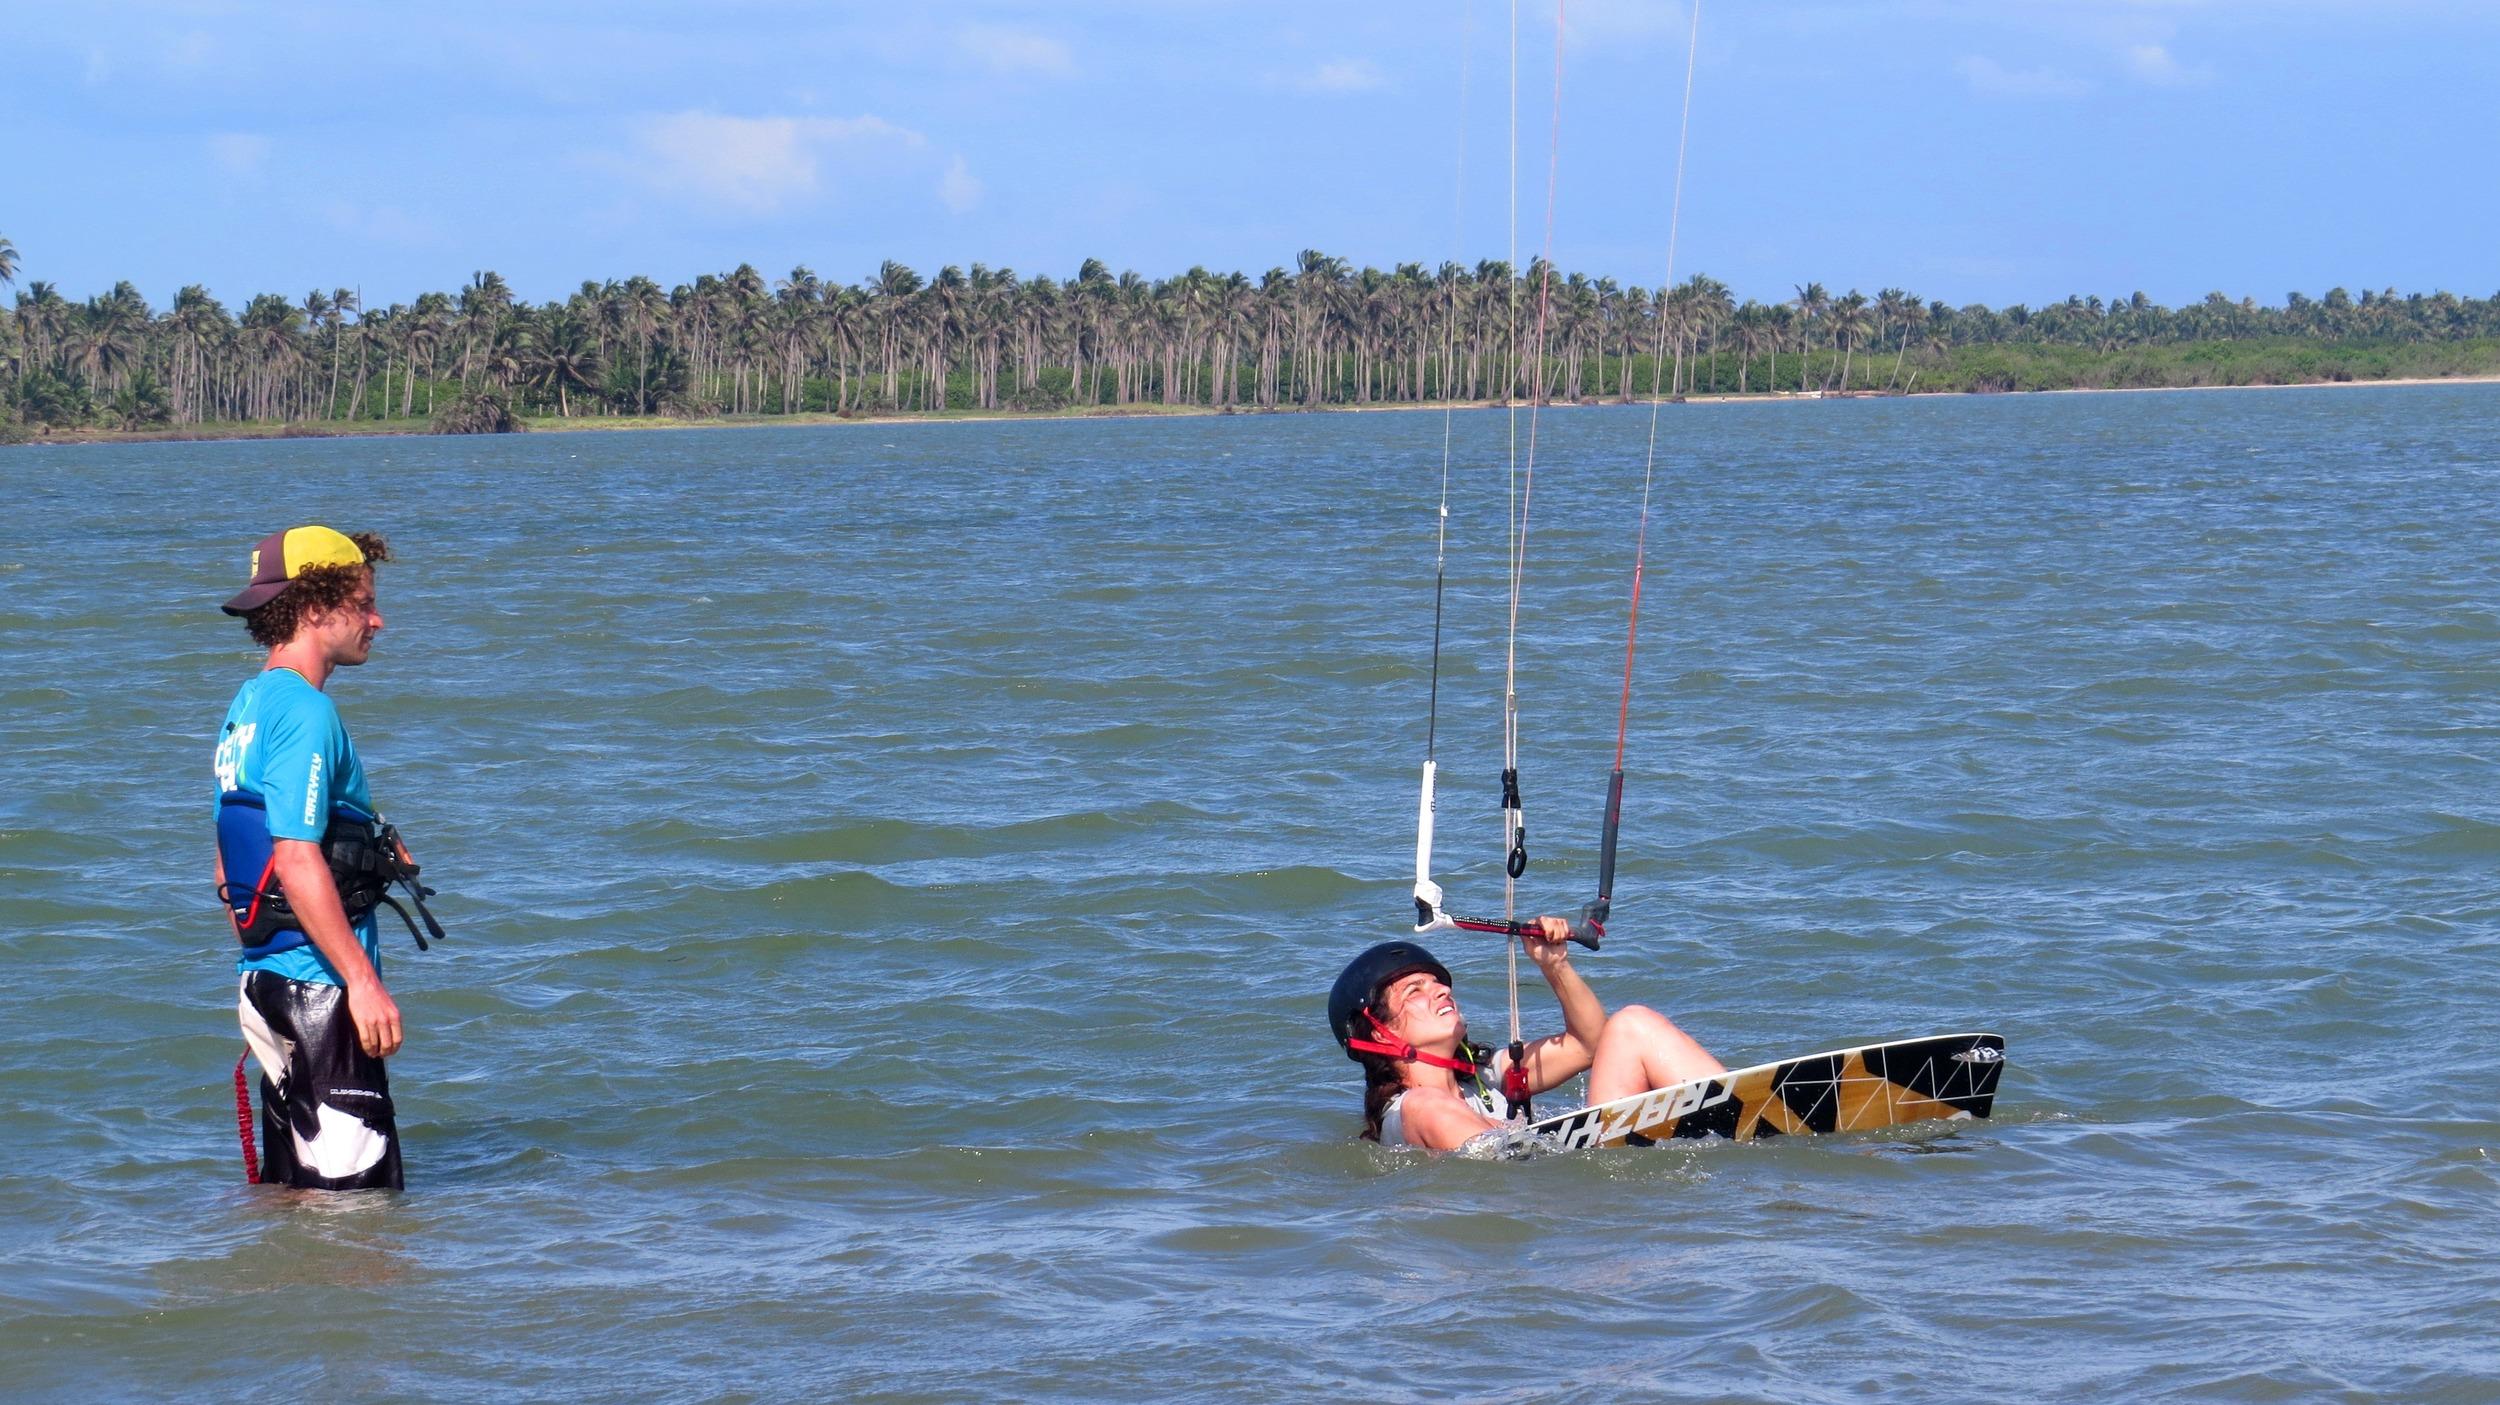 Flat water training